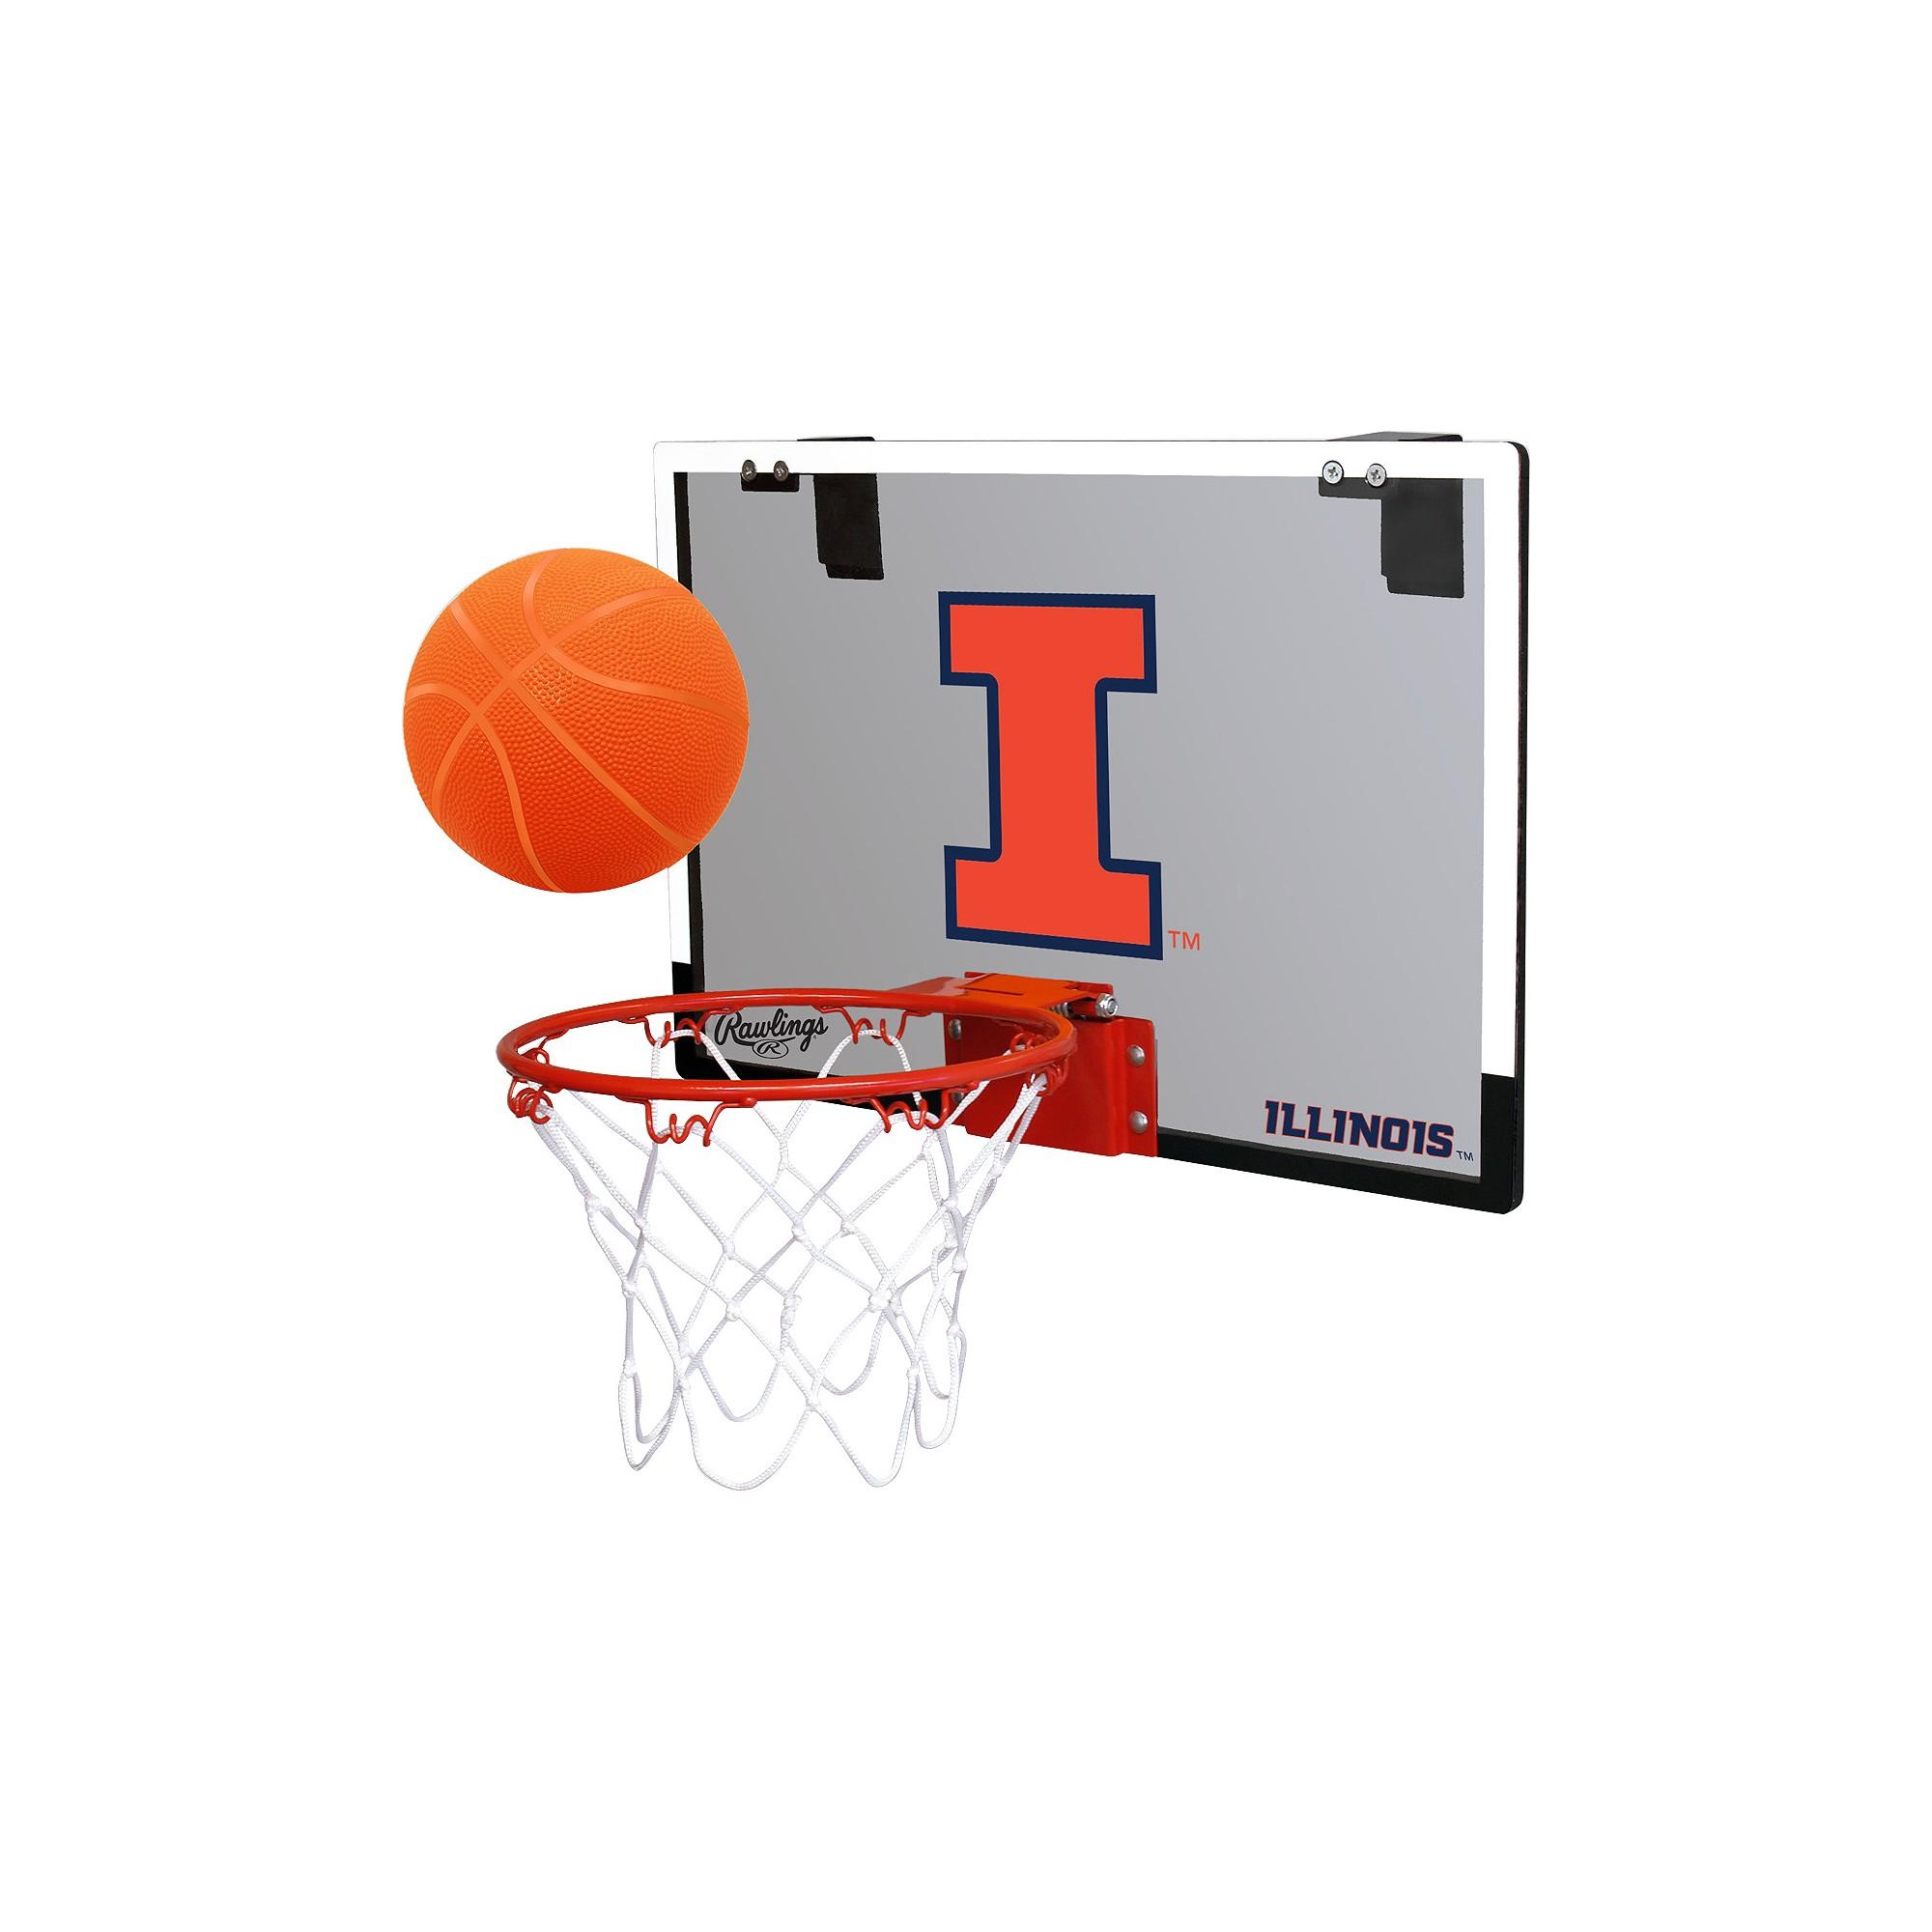 NCAA Illinois Fighting Illini RawlingsToy Basketball Set